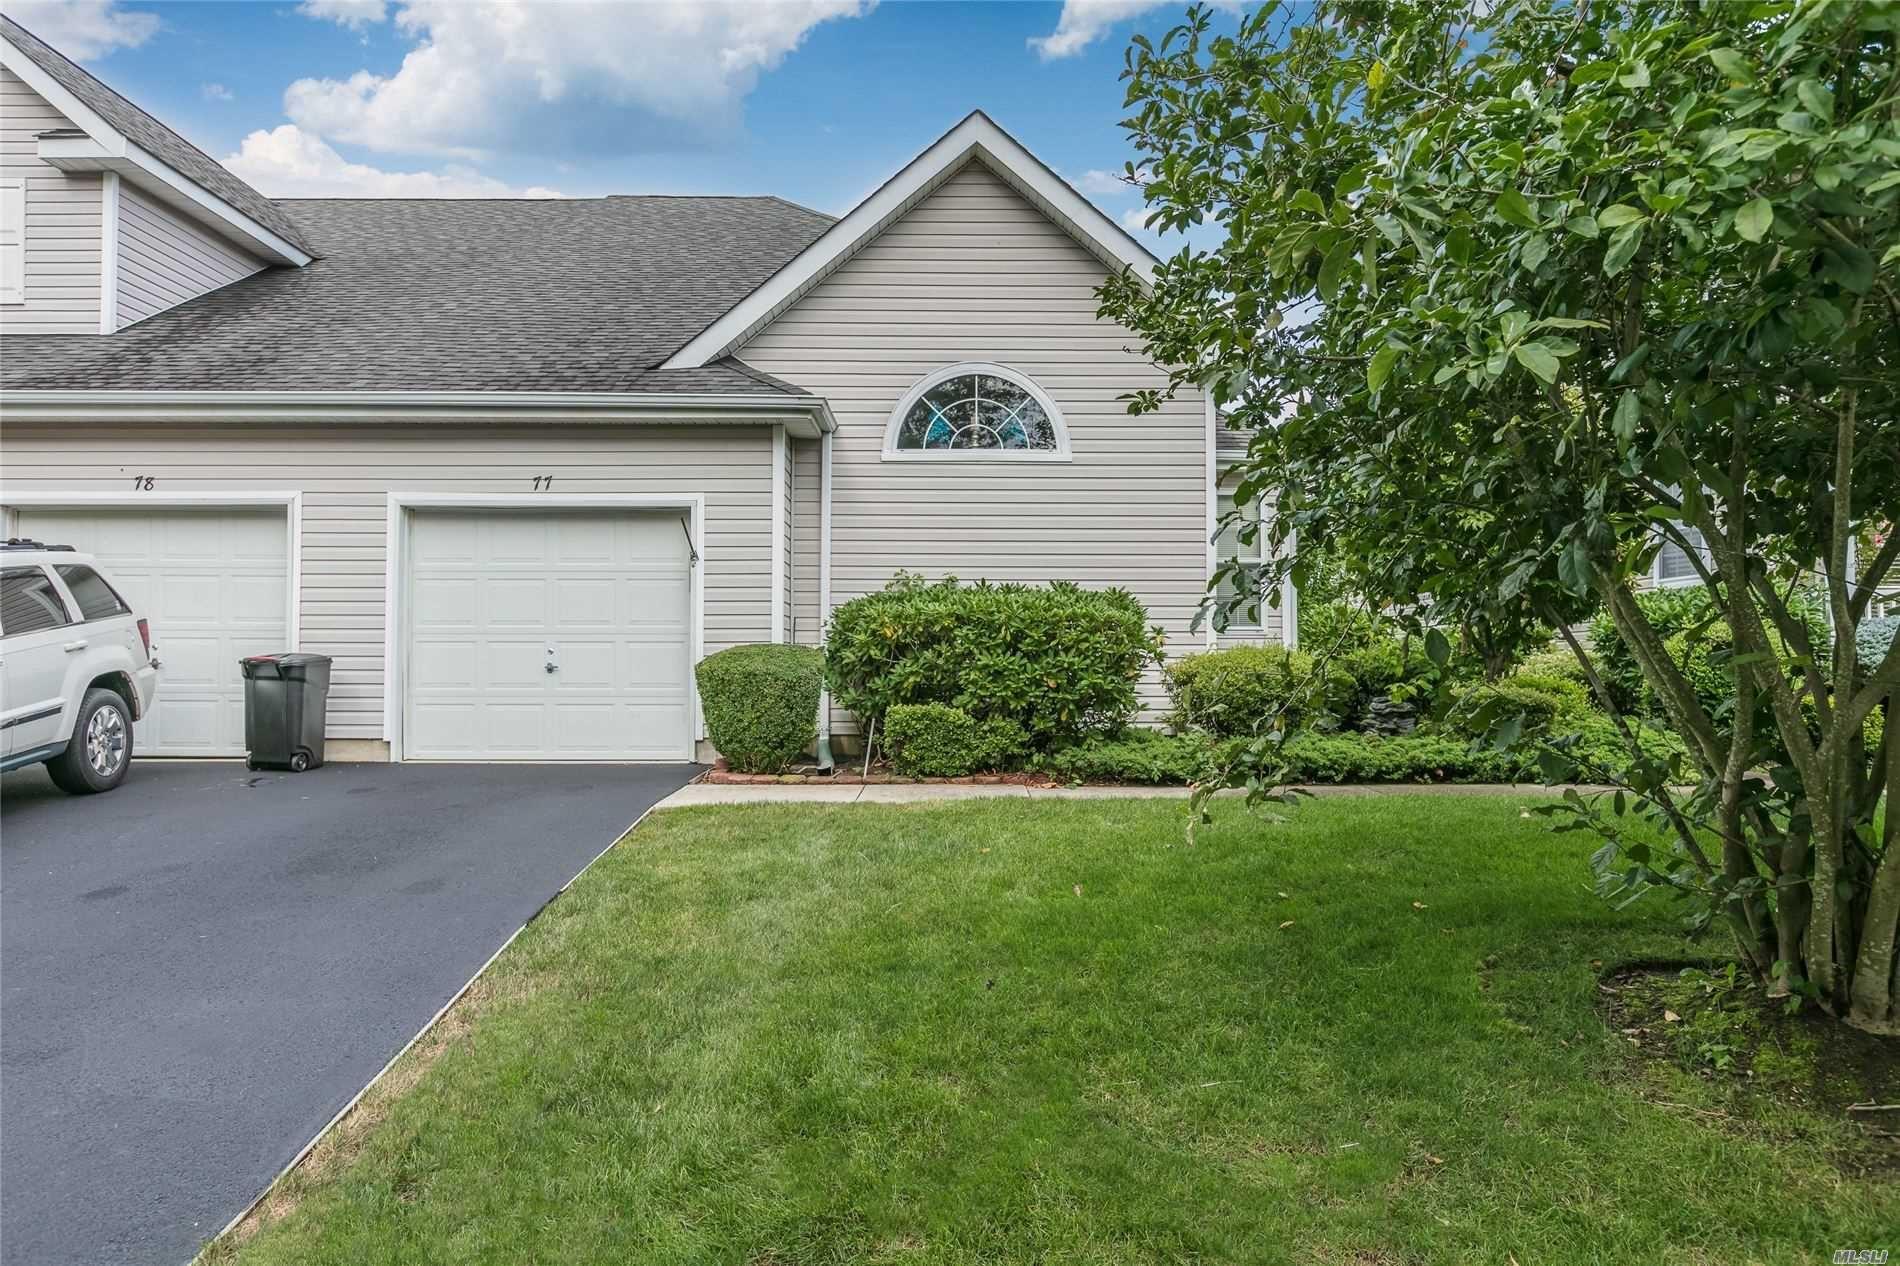 77 Saddle Lakes Drive, Riverhead, NY 11901 - MLS#: 3246924